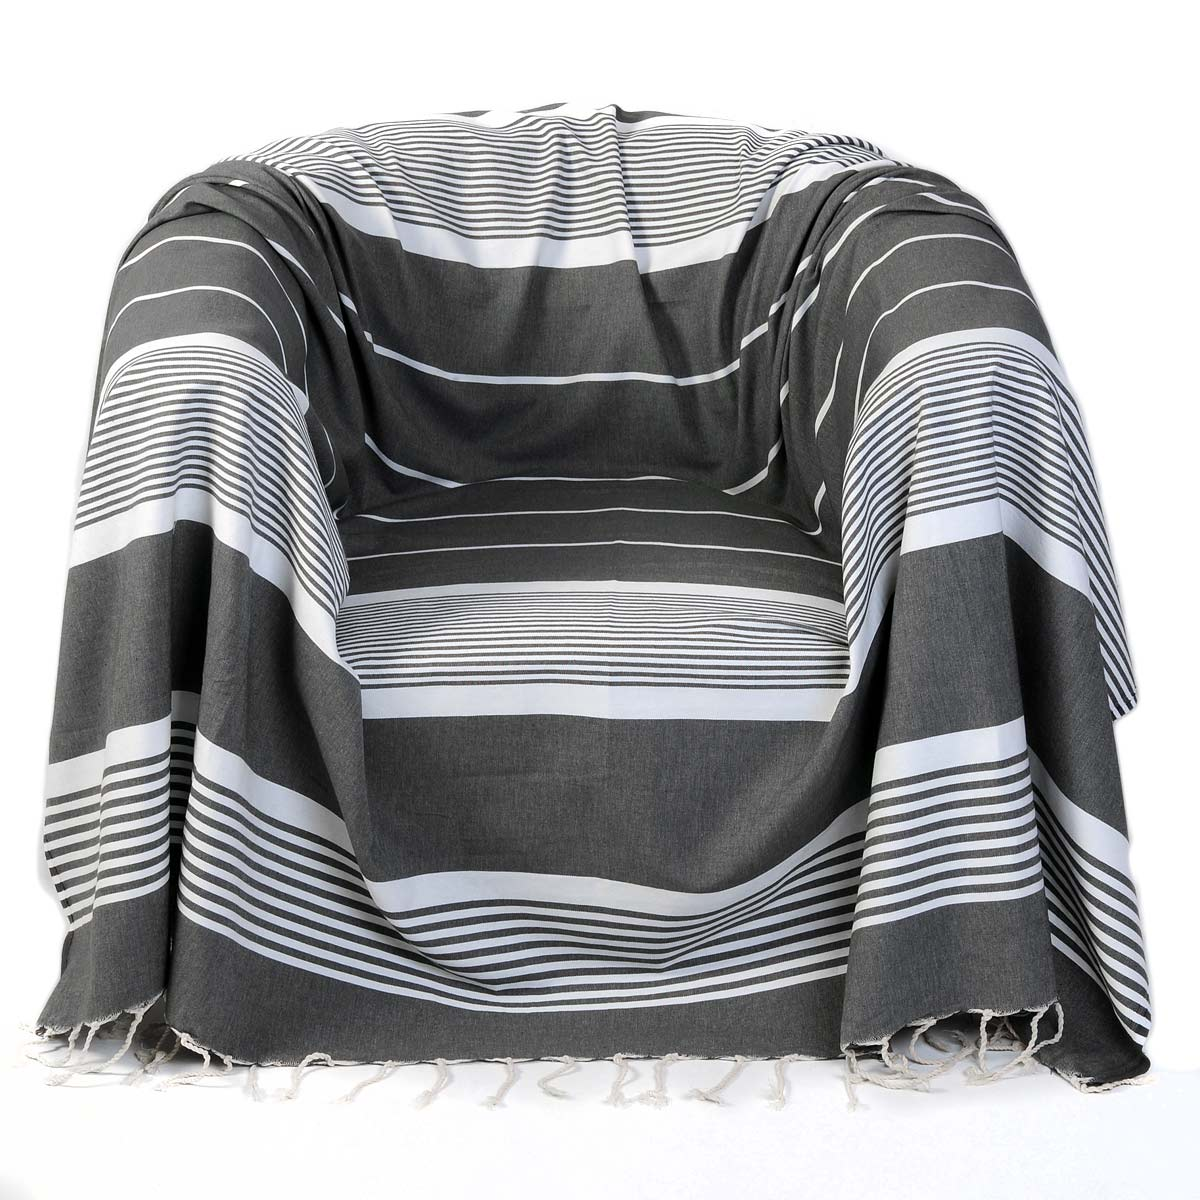 CARTHAGE - Jeté fauteuil coton anthracite rayures blanches 200 x 200